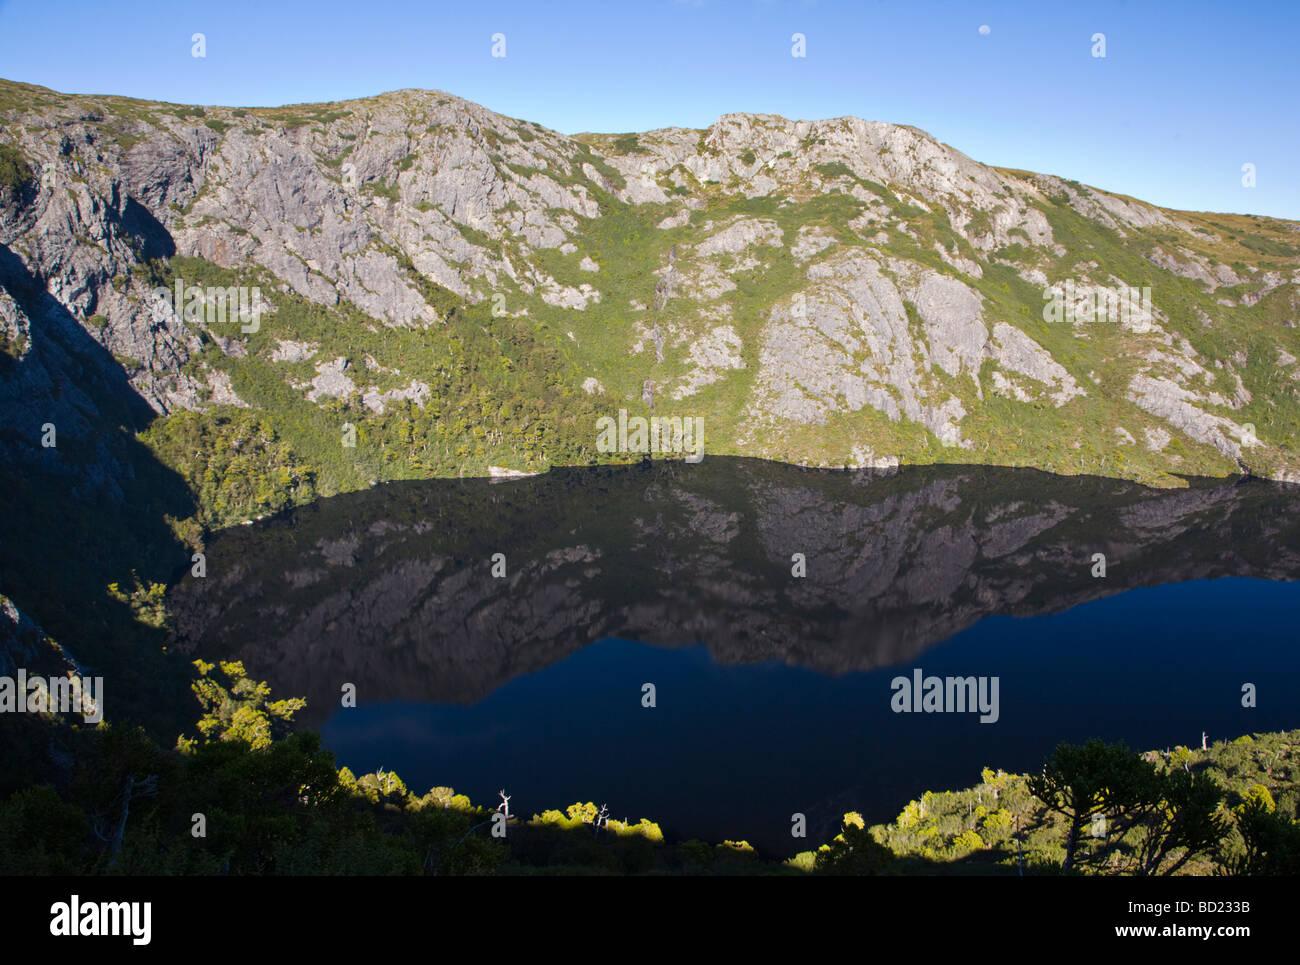 Crater Lake Cradle Mountain National Park Tasmania Australia - Stock Image